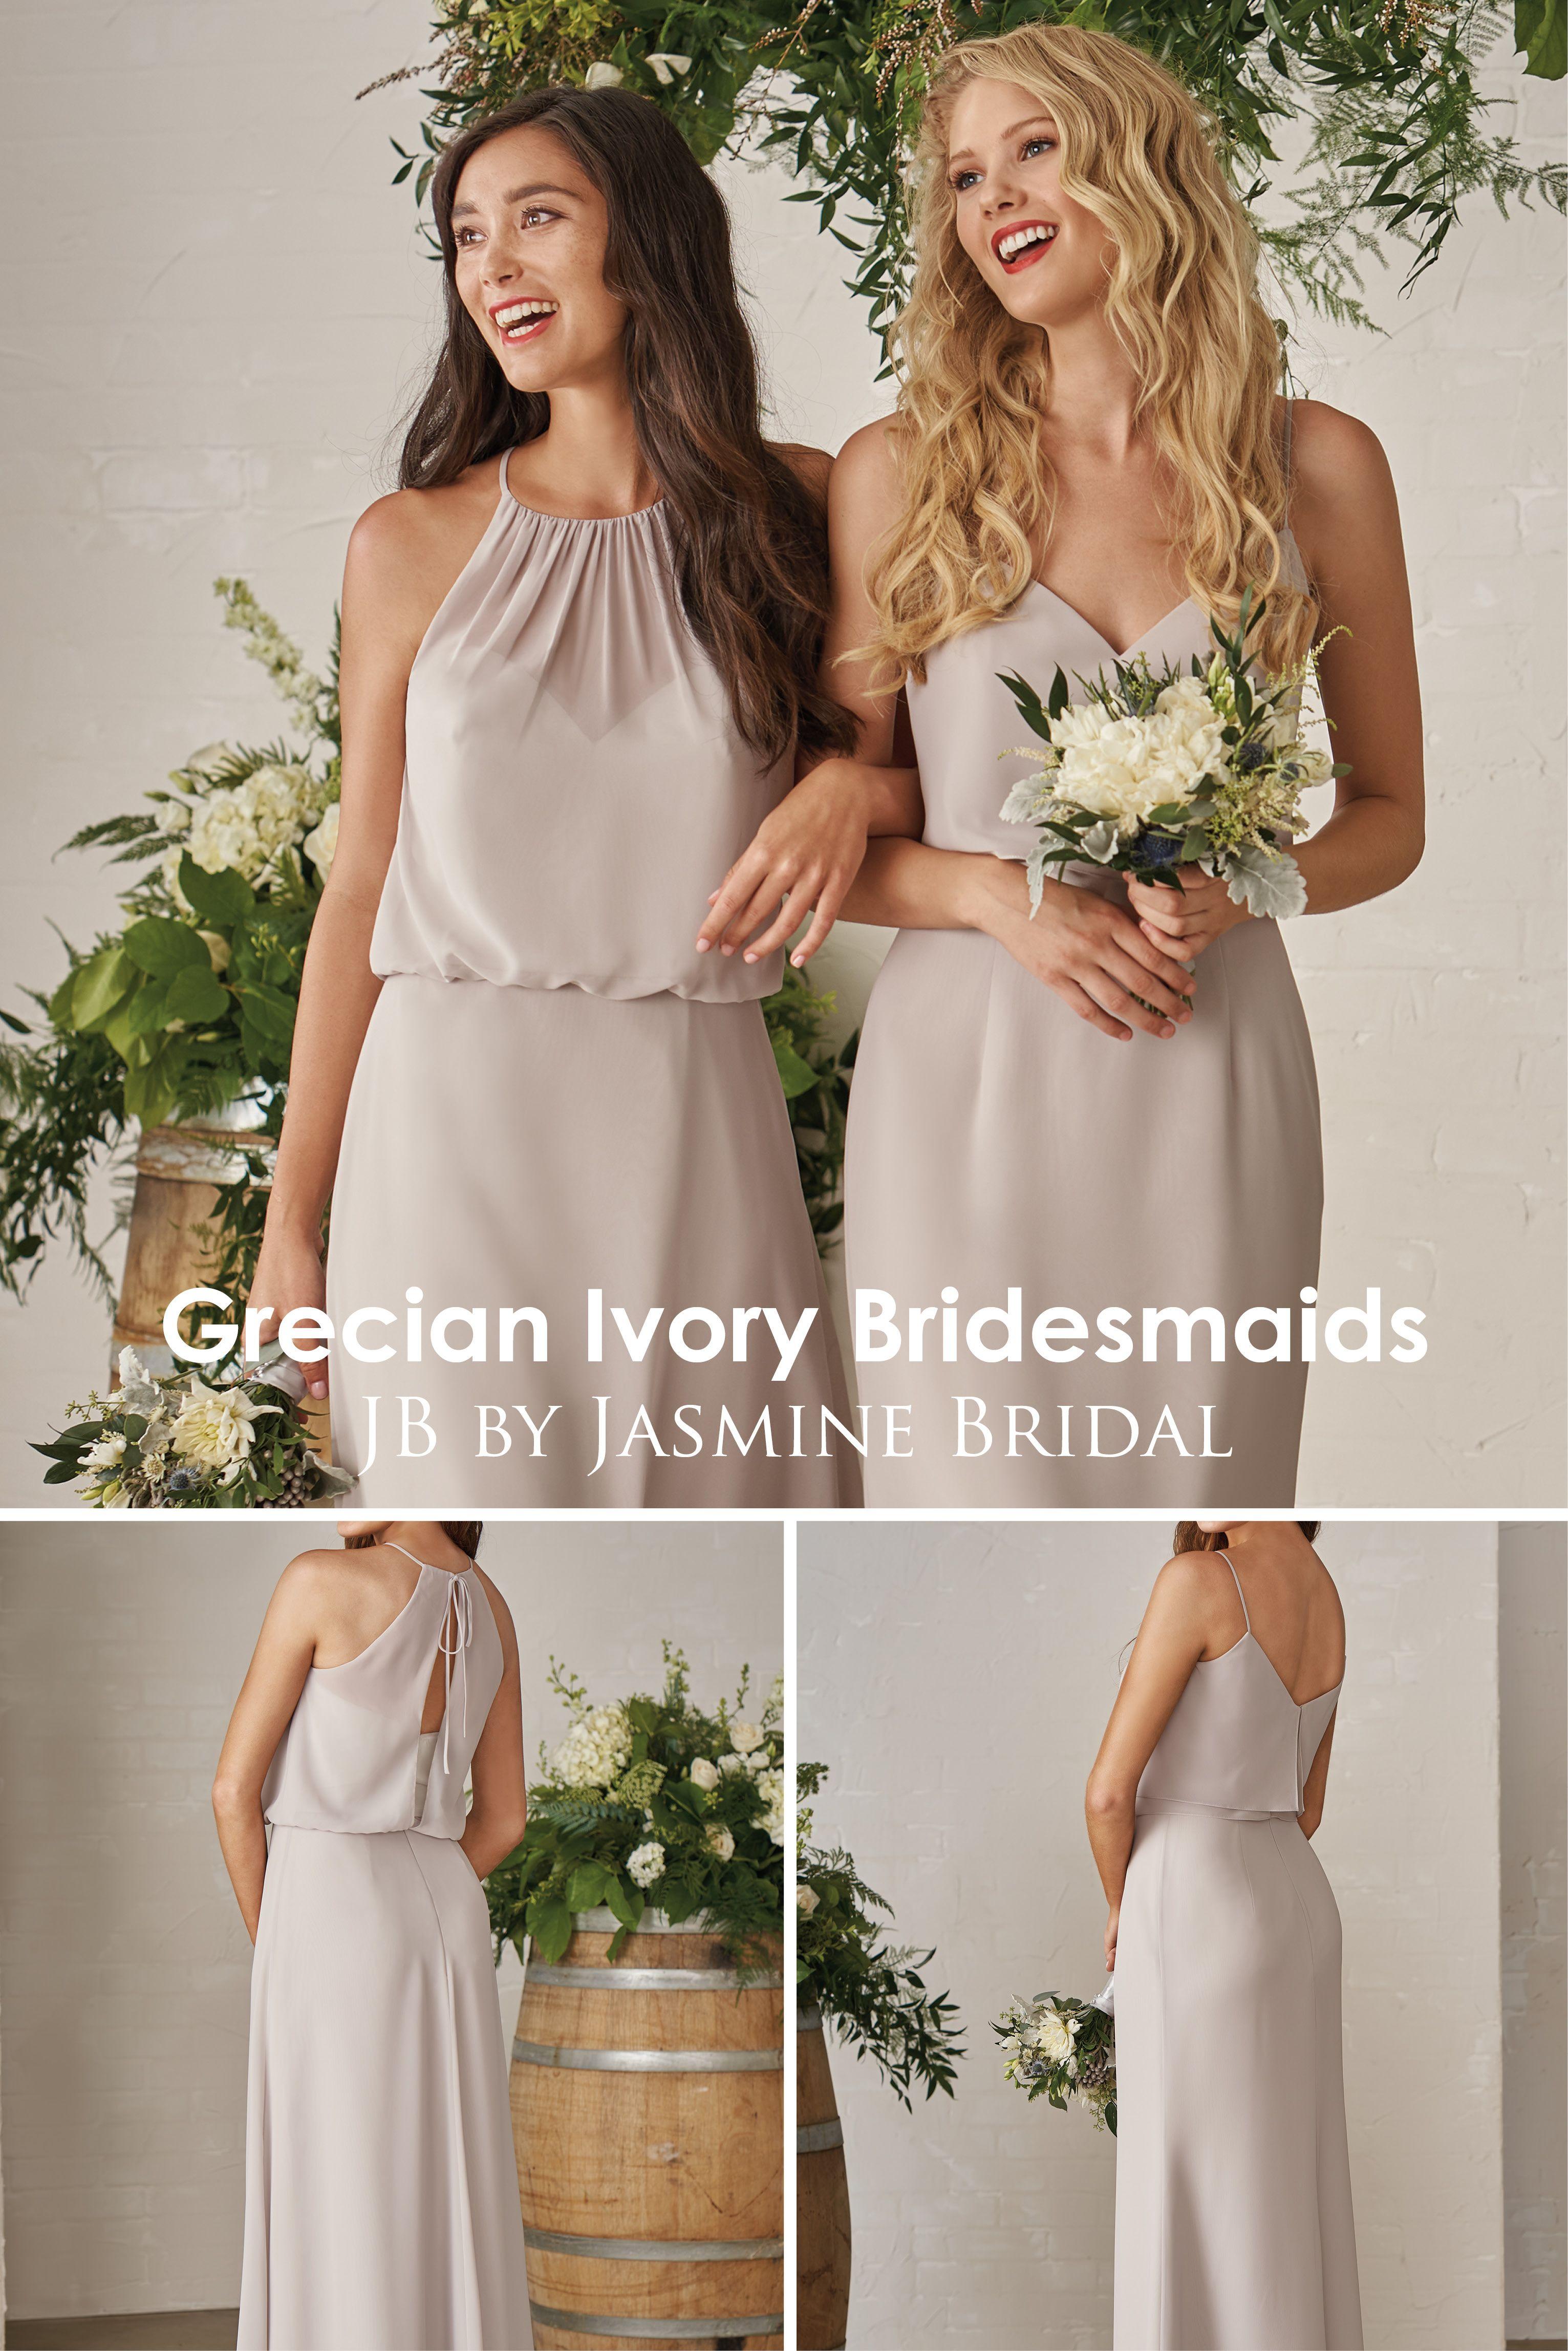 Jasmine bridal jb grecian ivory bridesmaids neutral bridal jasmine bridal jb grecian ivory bridesmaids neutral bridal party simple bridesmaid dresses ombrellifo Images